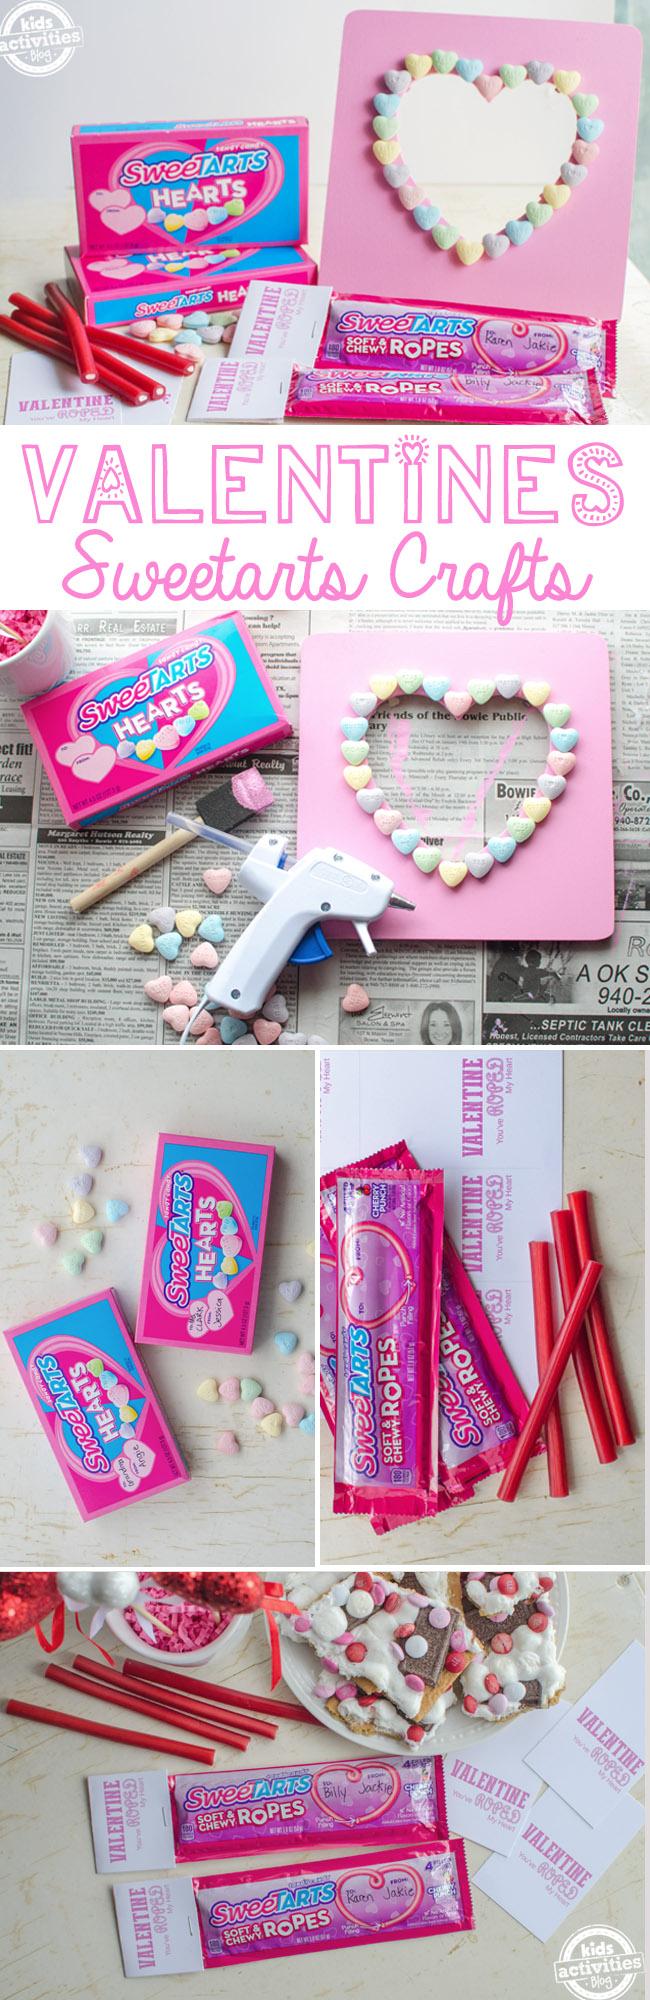 sweetarts hearts craft